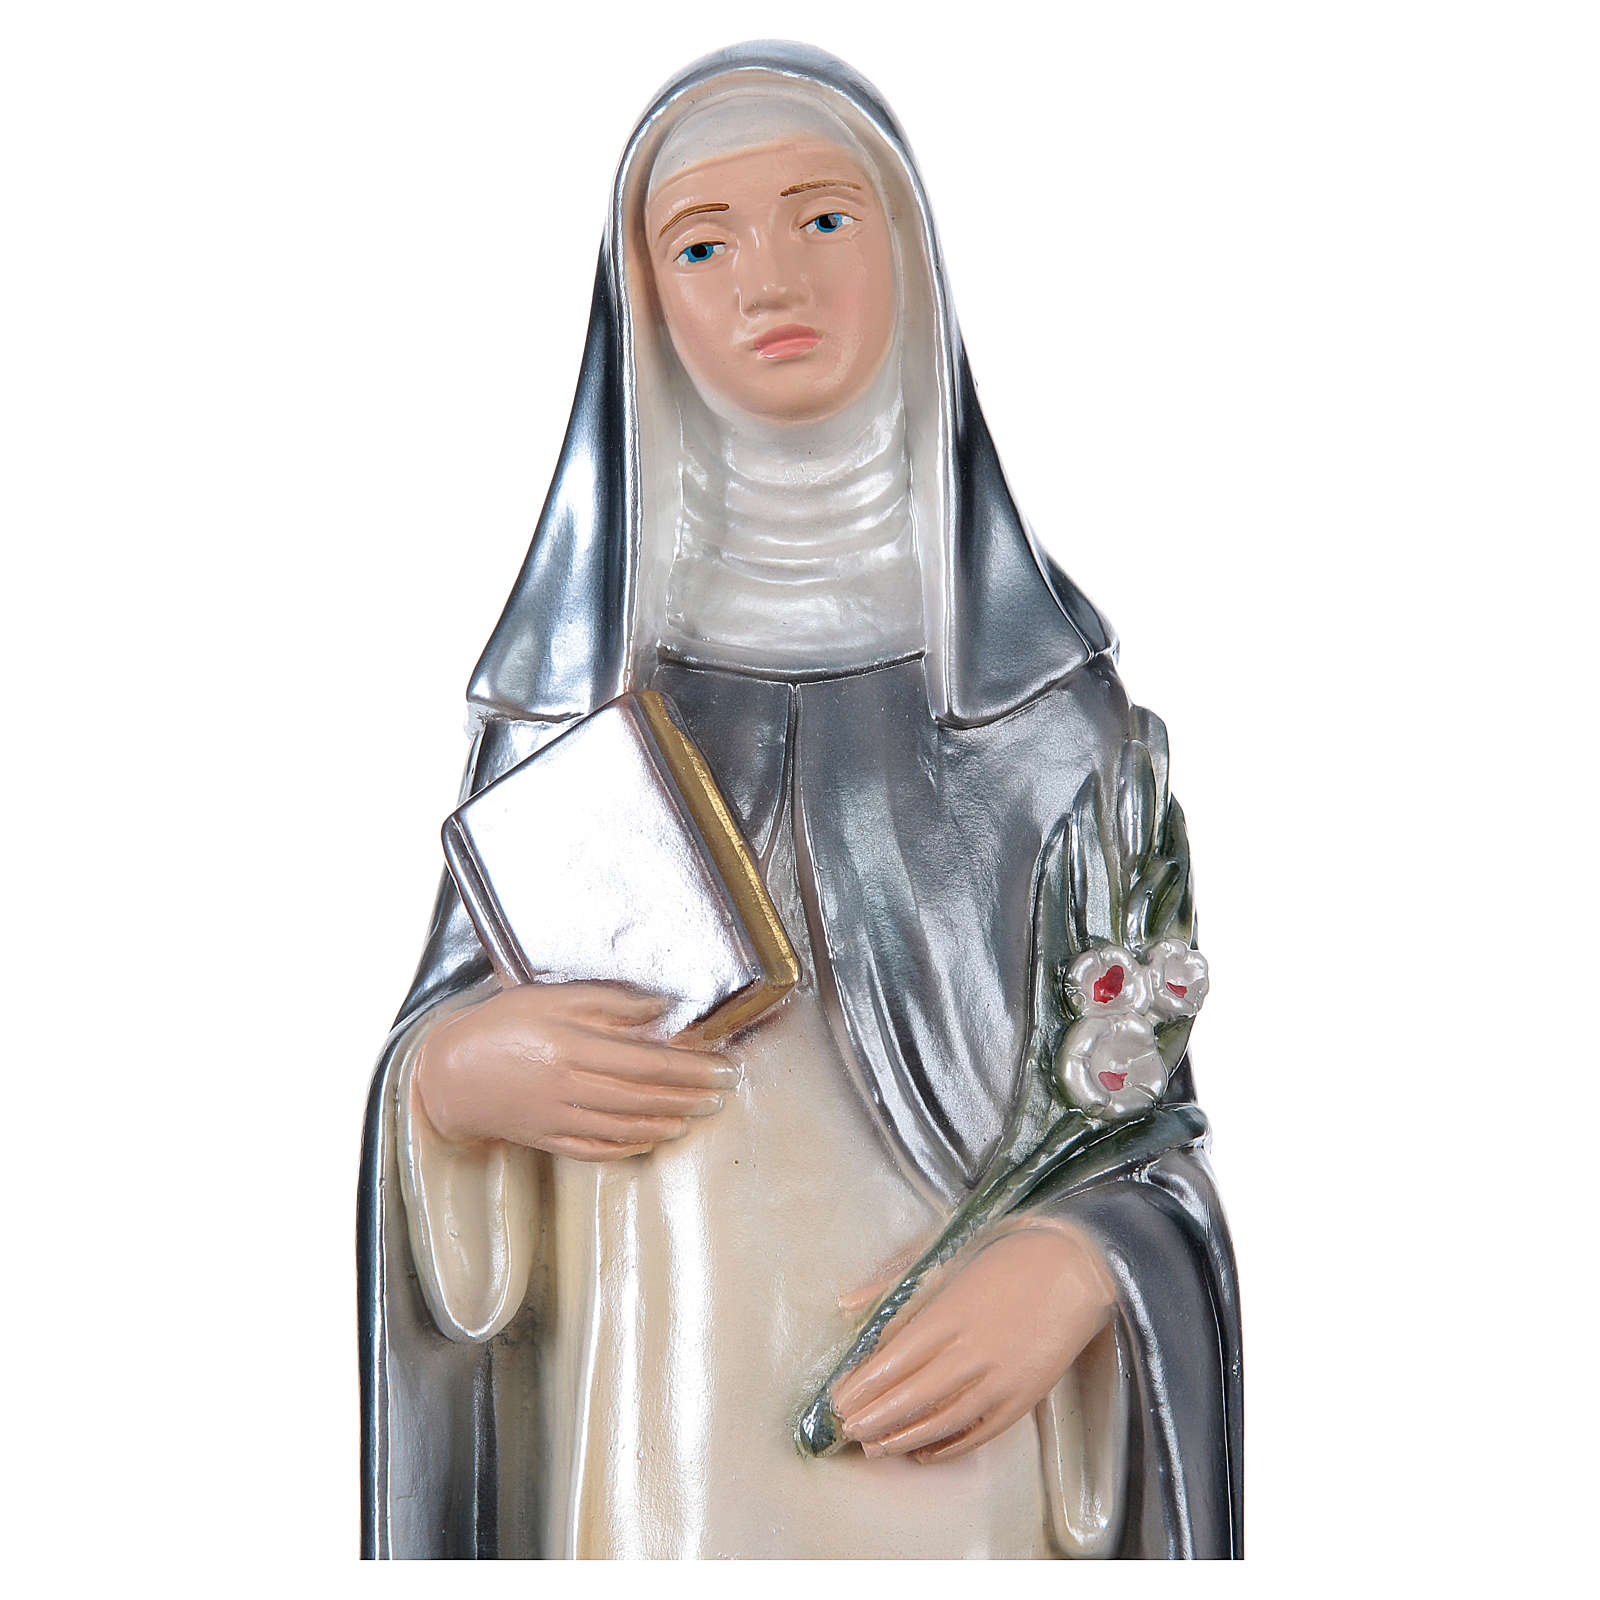 Estatua yeso nacarado Santa Caterina de Siena 30 cm 4